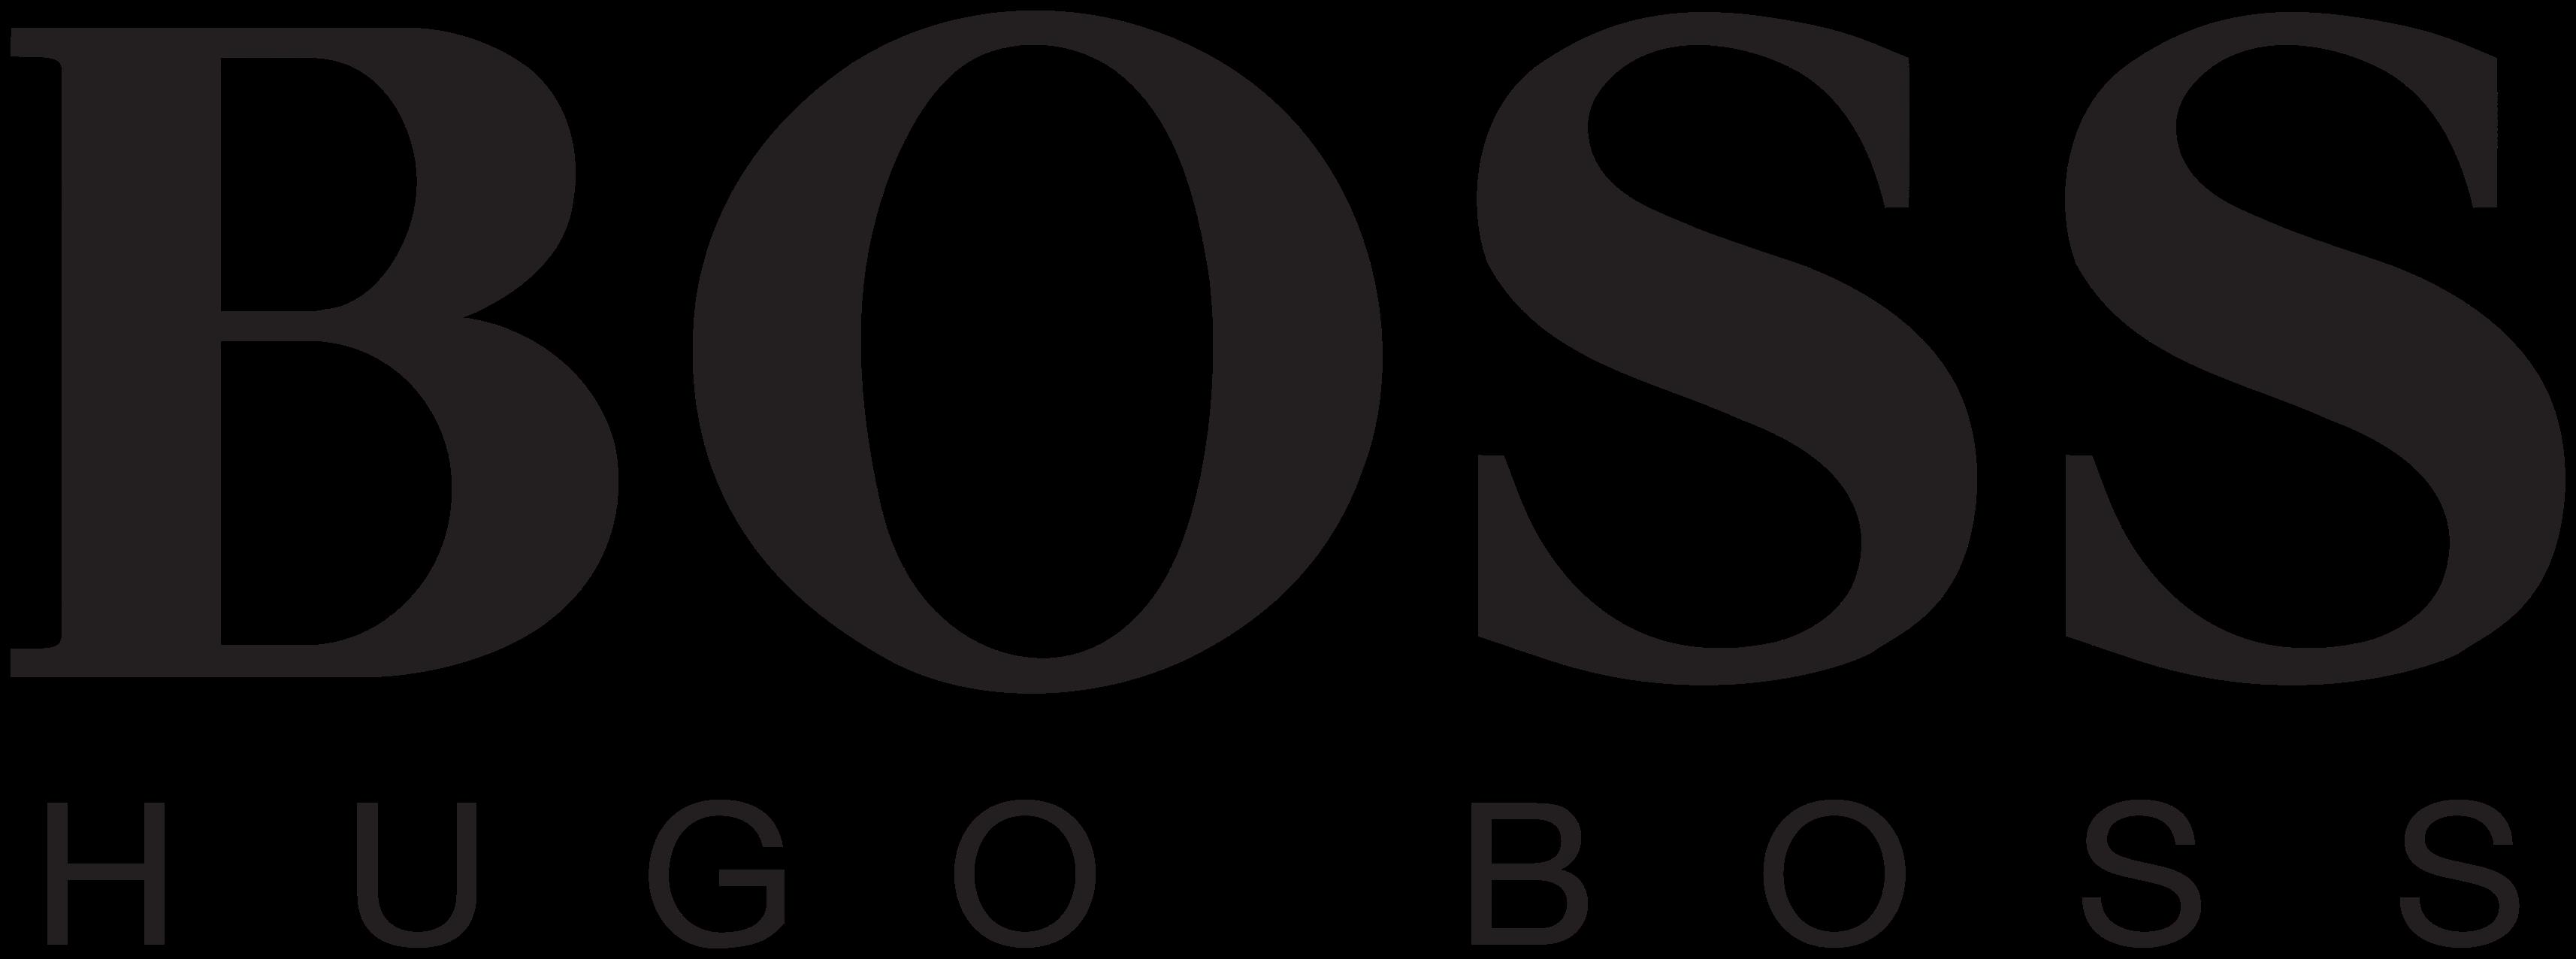 hugo boss � logos download